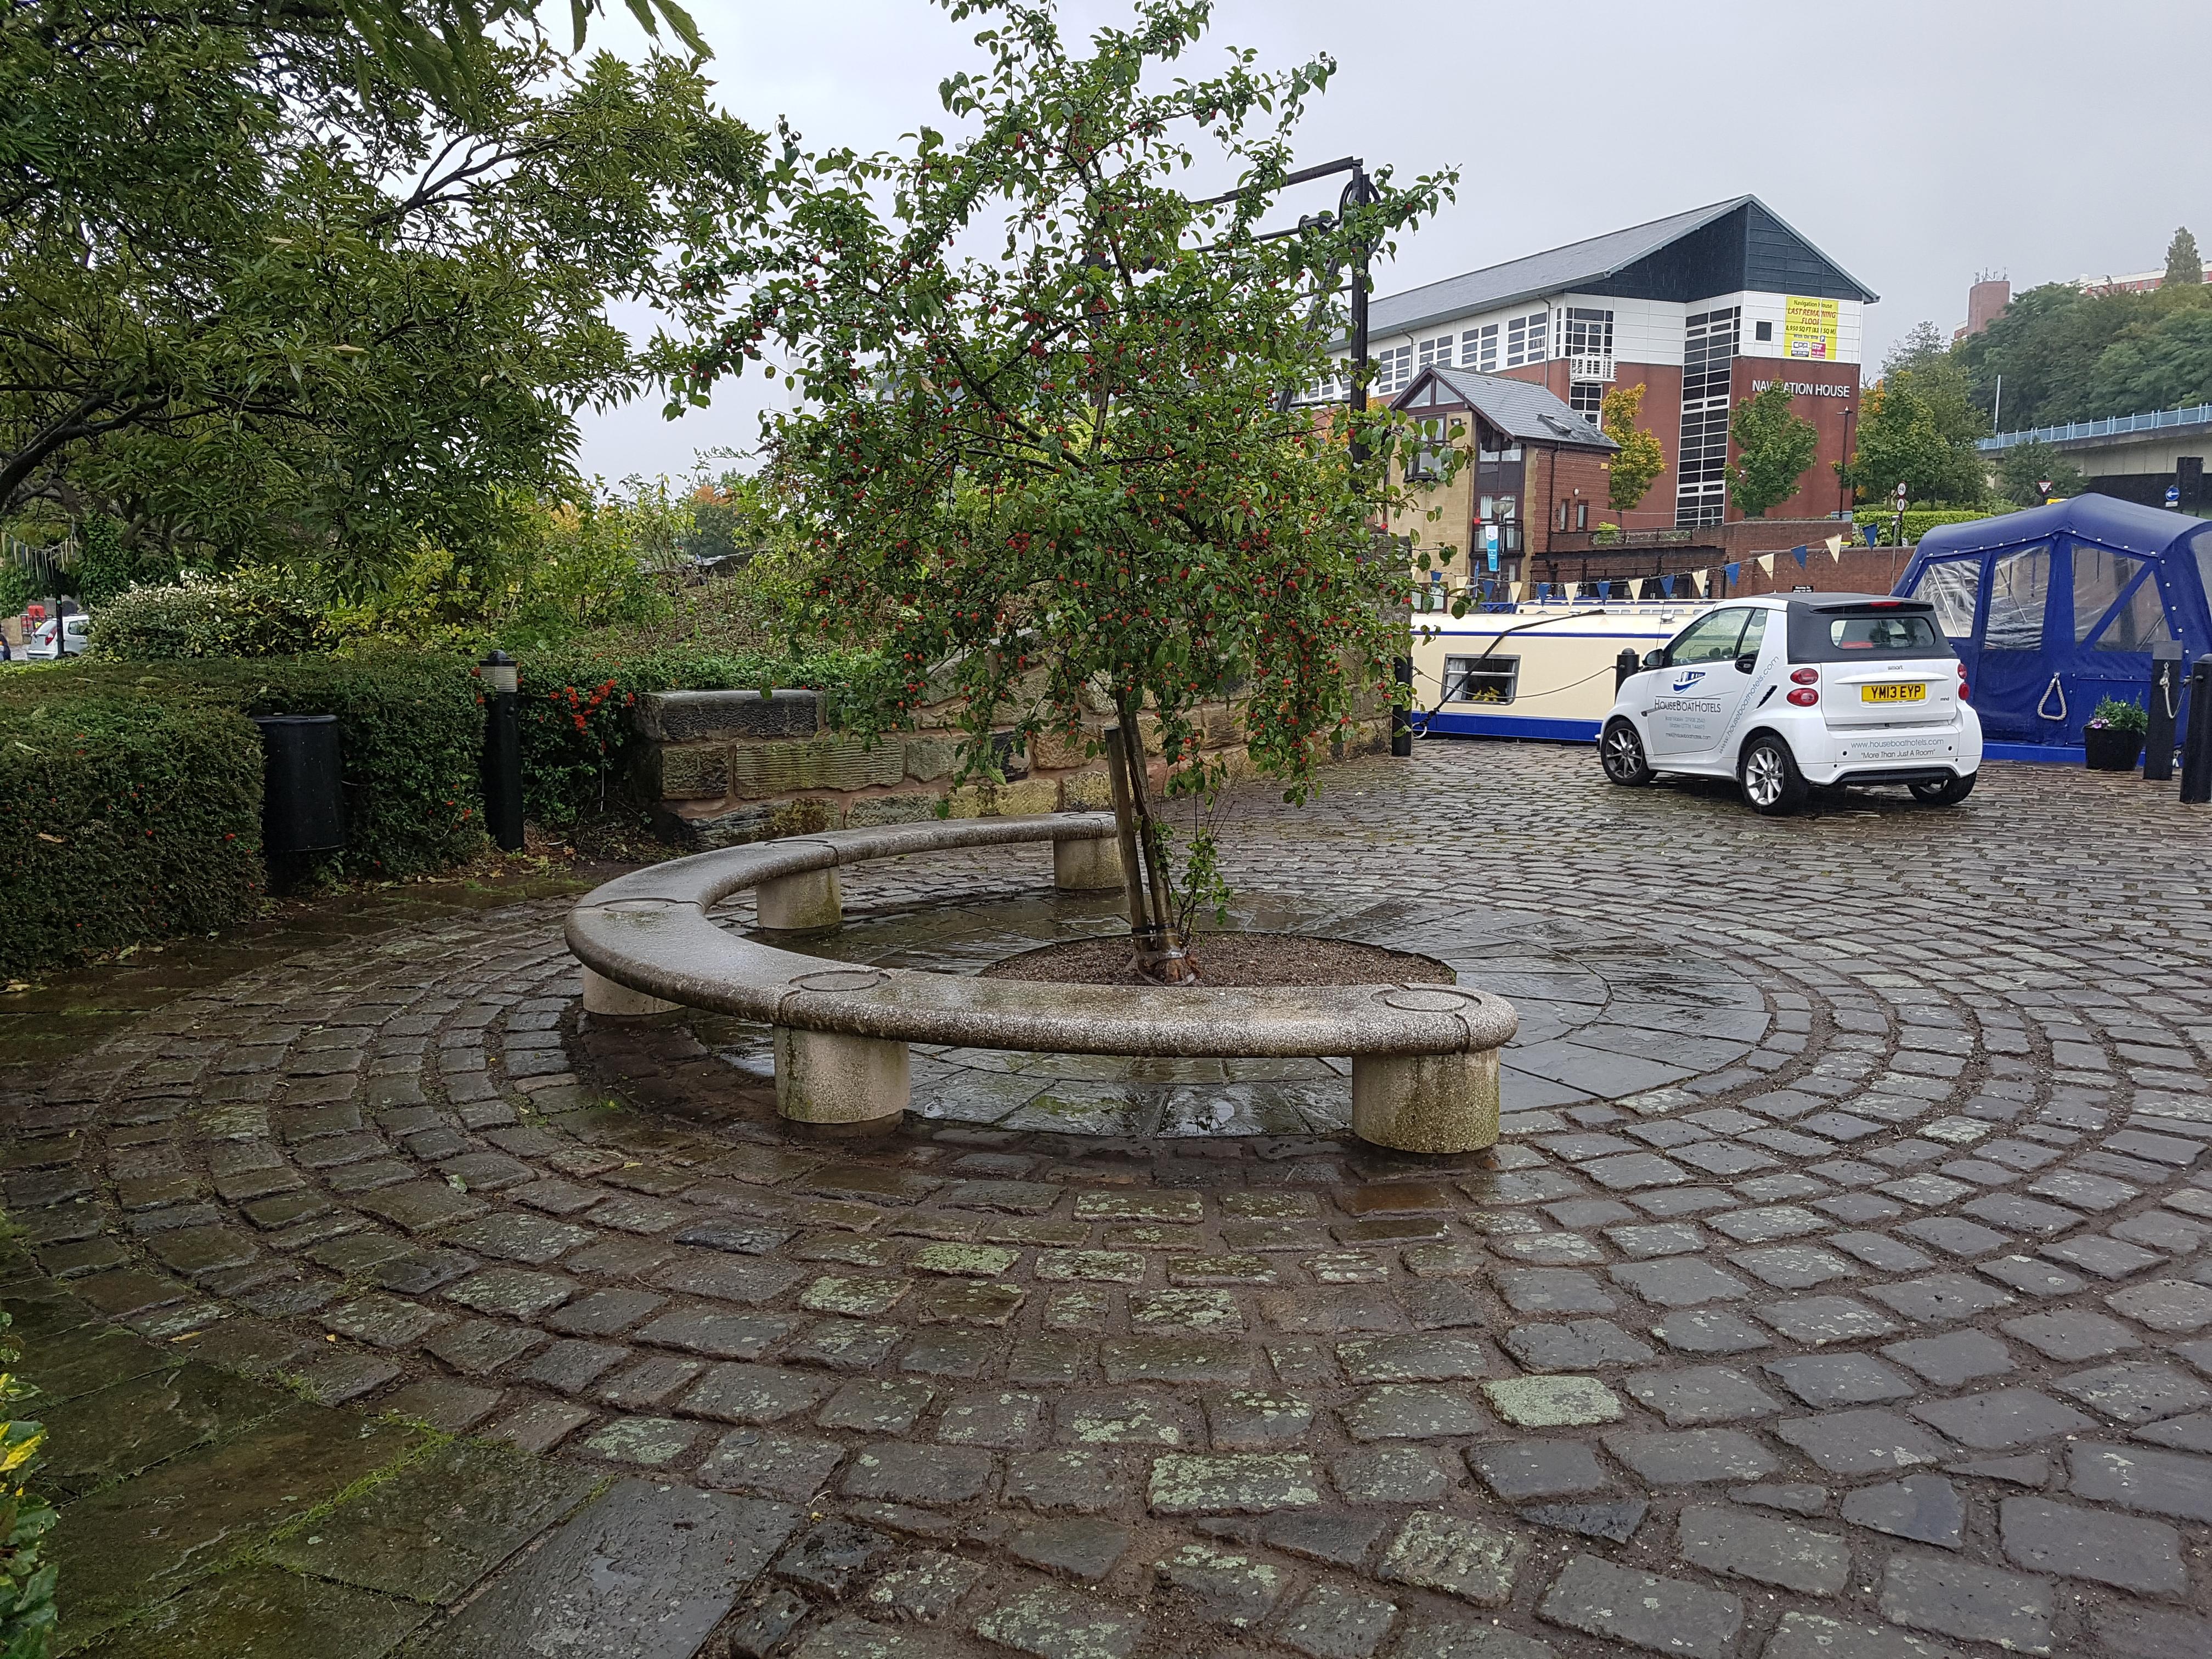 Tree in Victoria Quays